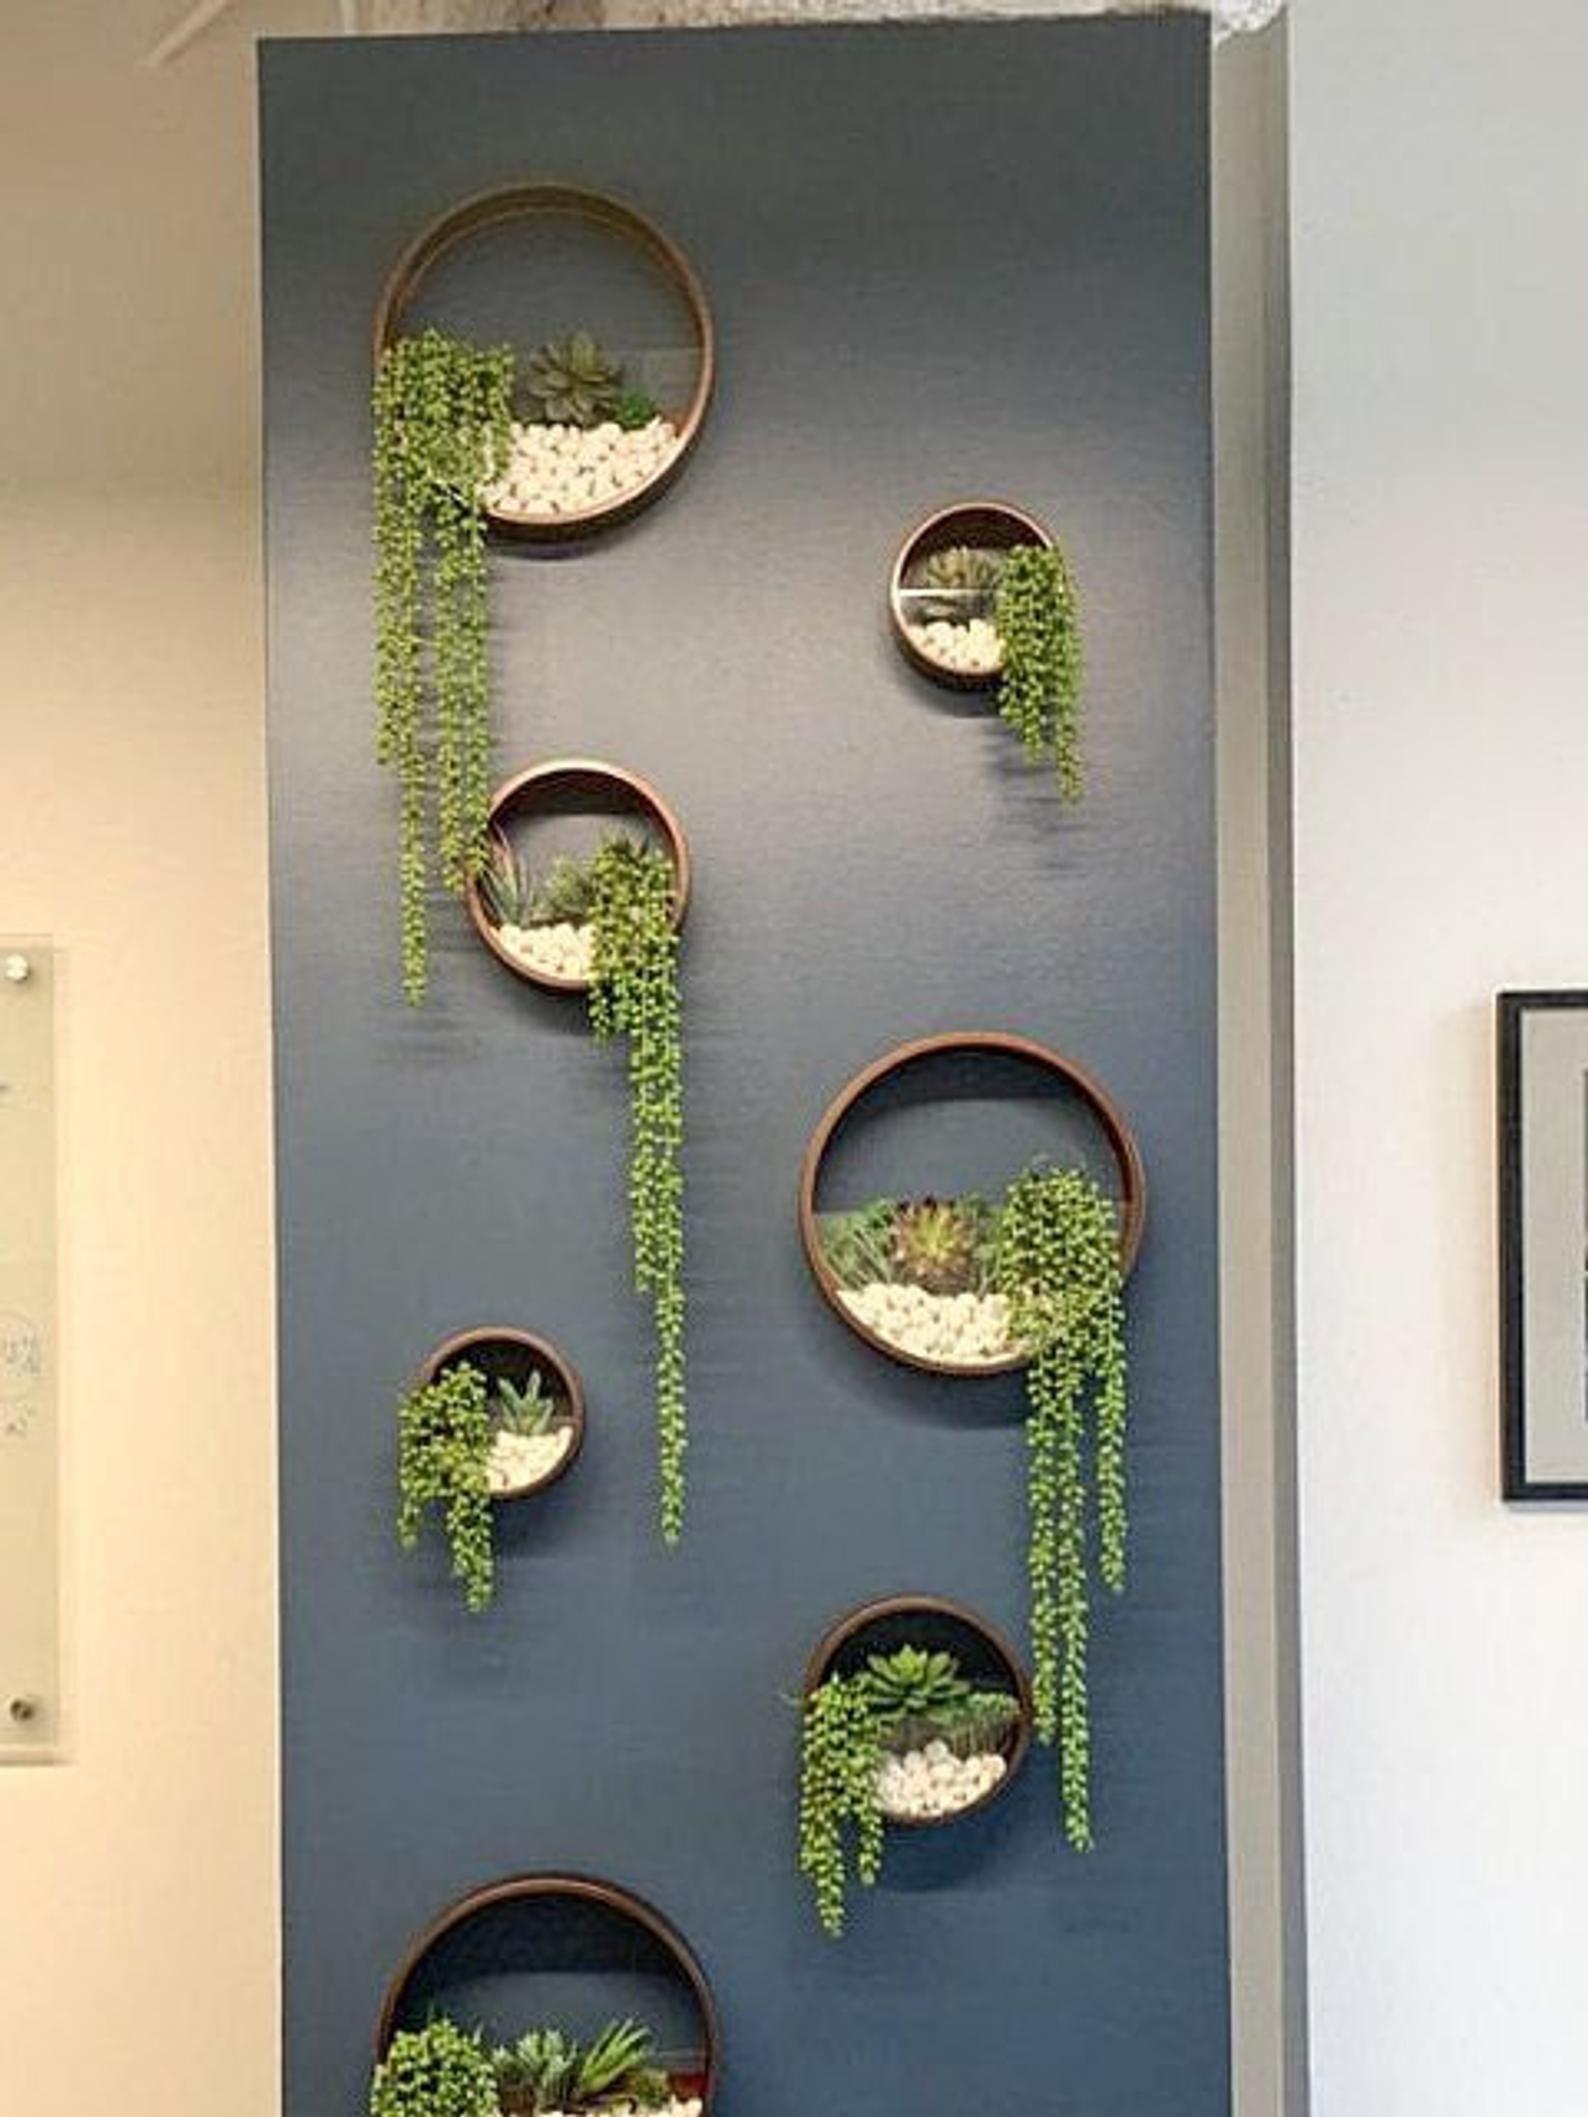 27 creative diy wall decor ideas that will revolutionize